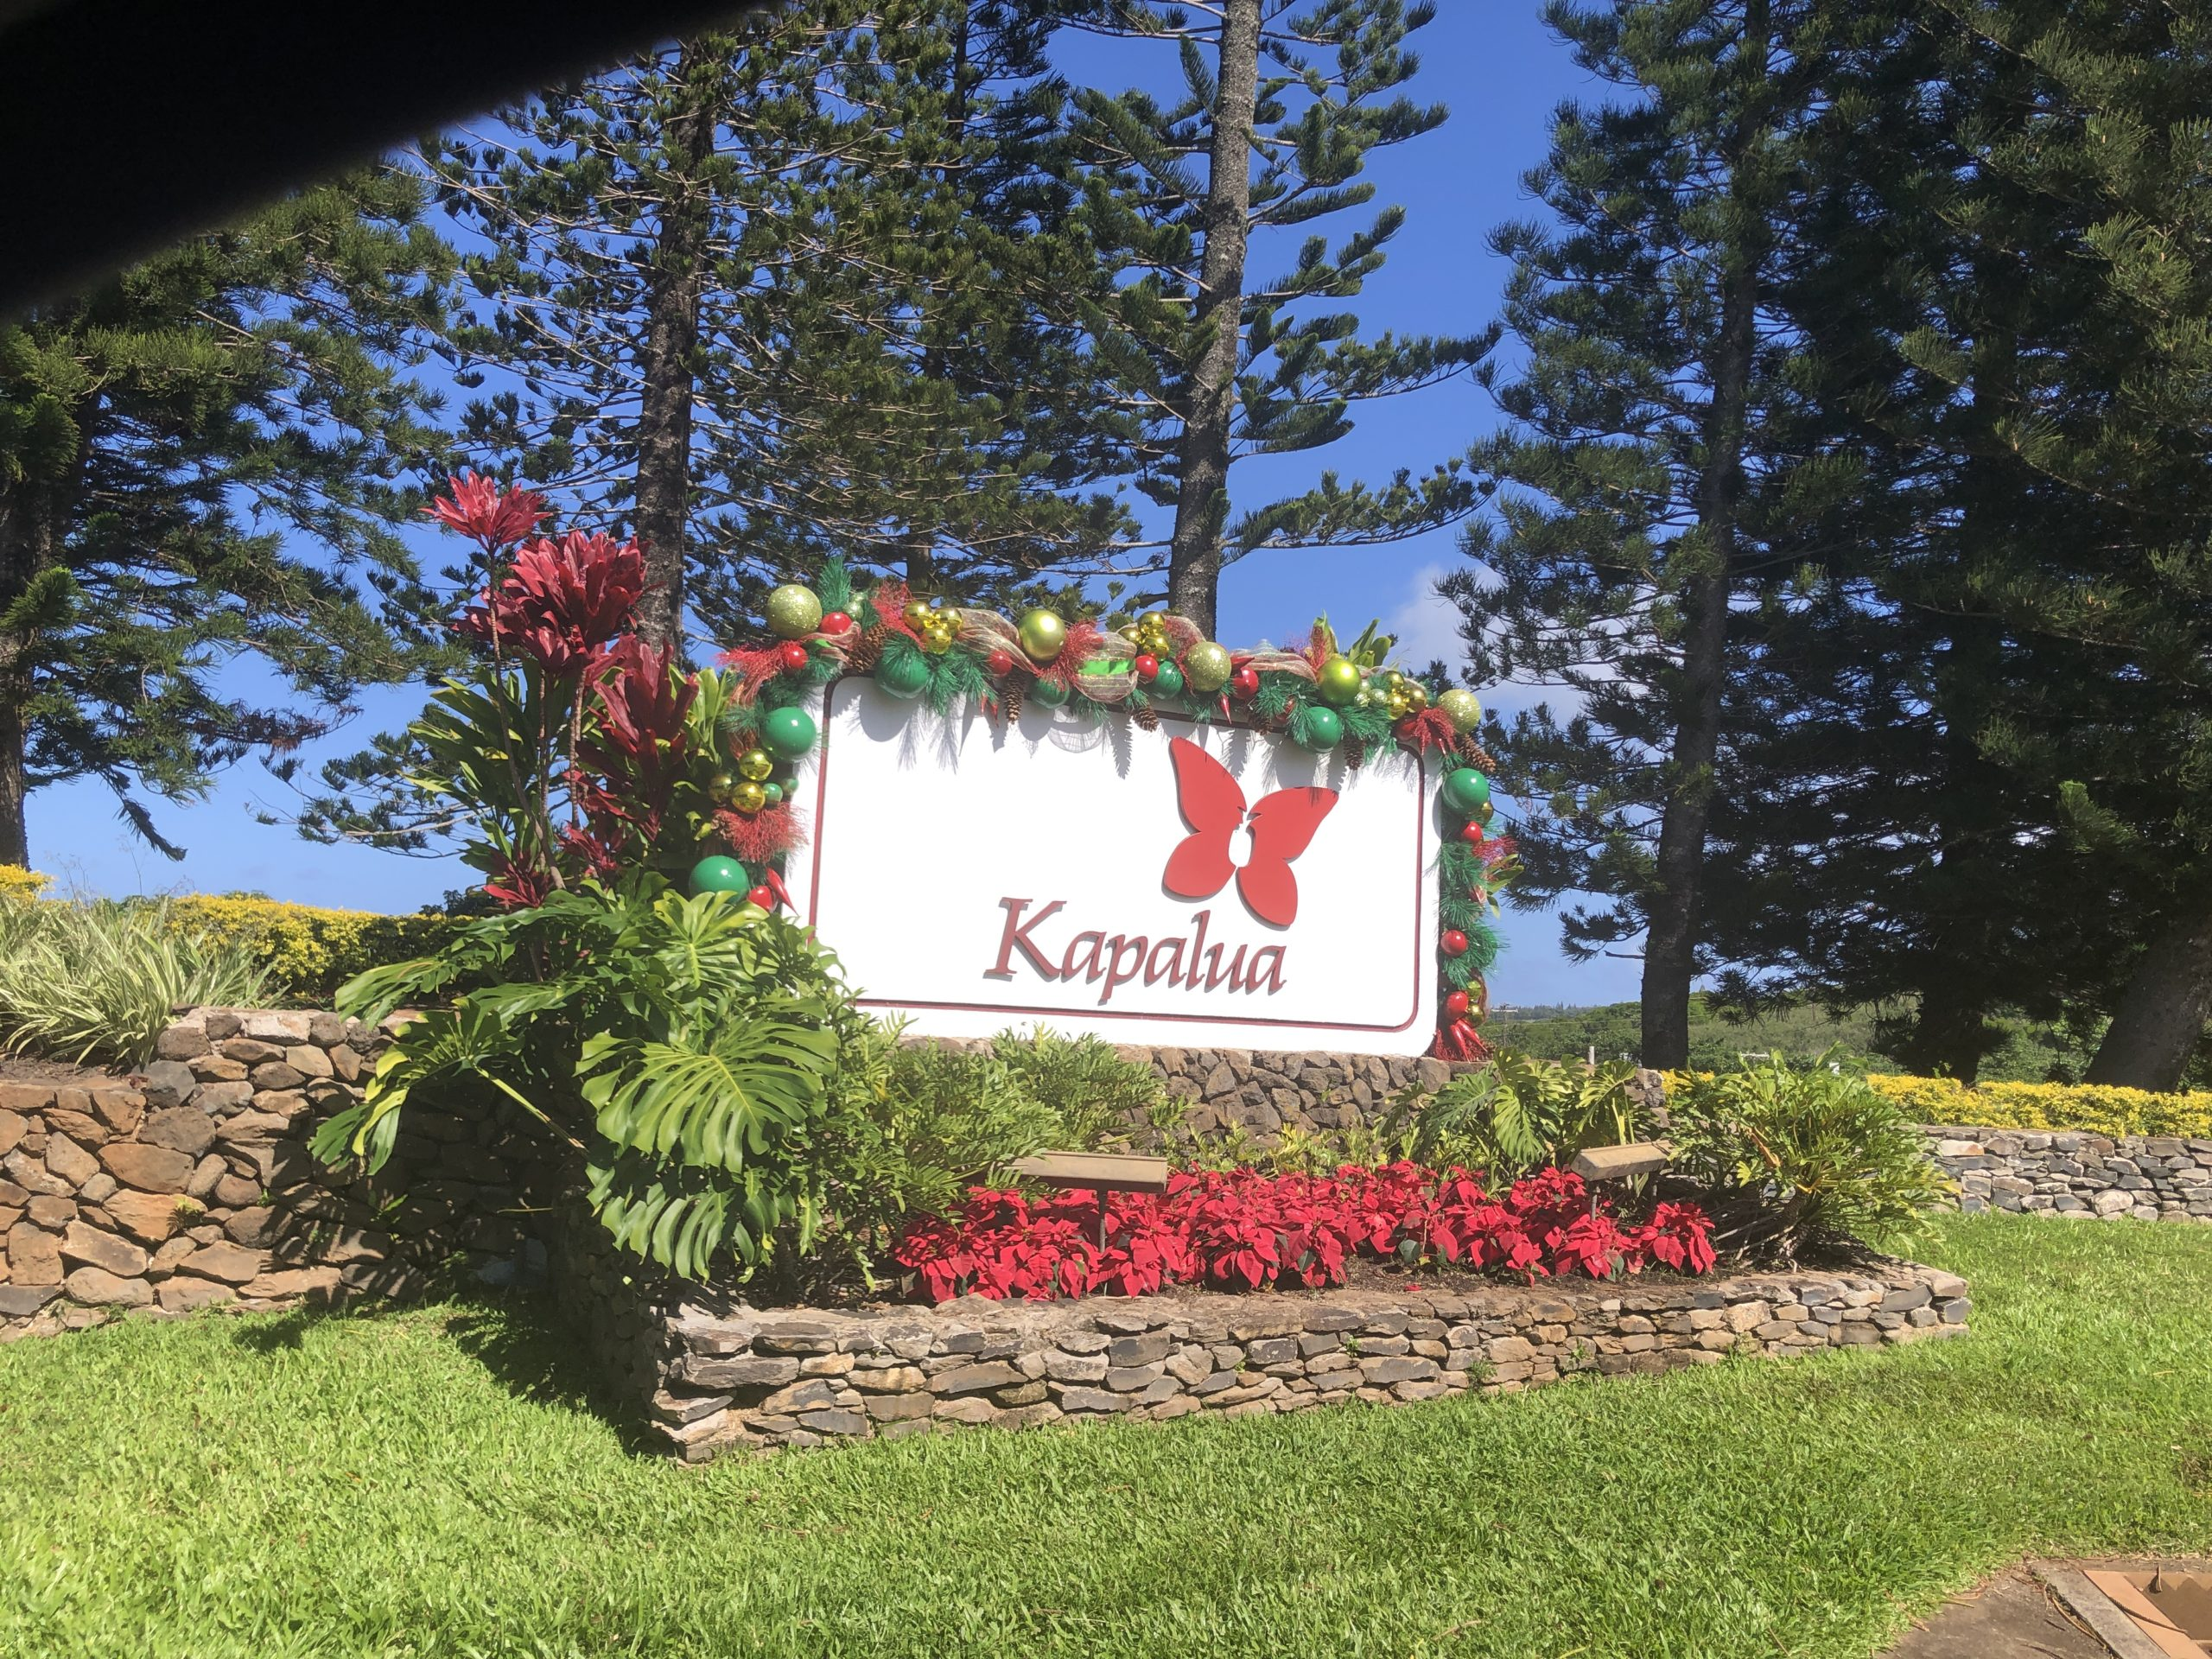 Welcome to Kapalua